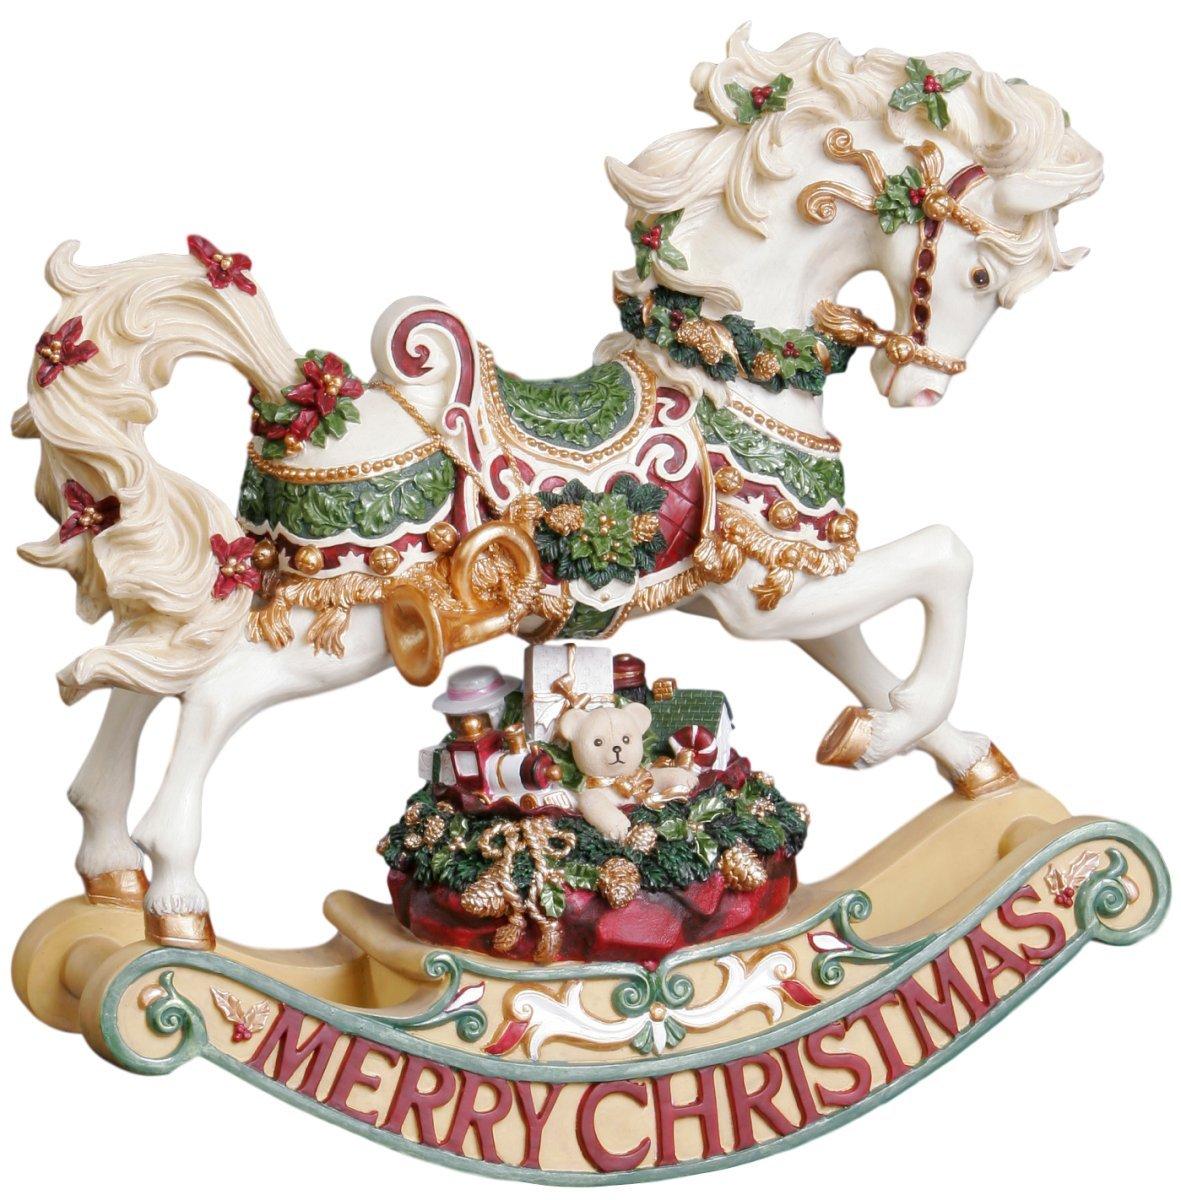 Image of A Christmas Favorite: Rocking Horse Musical Christmas Figurine